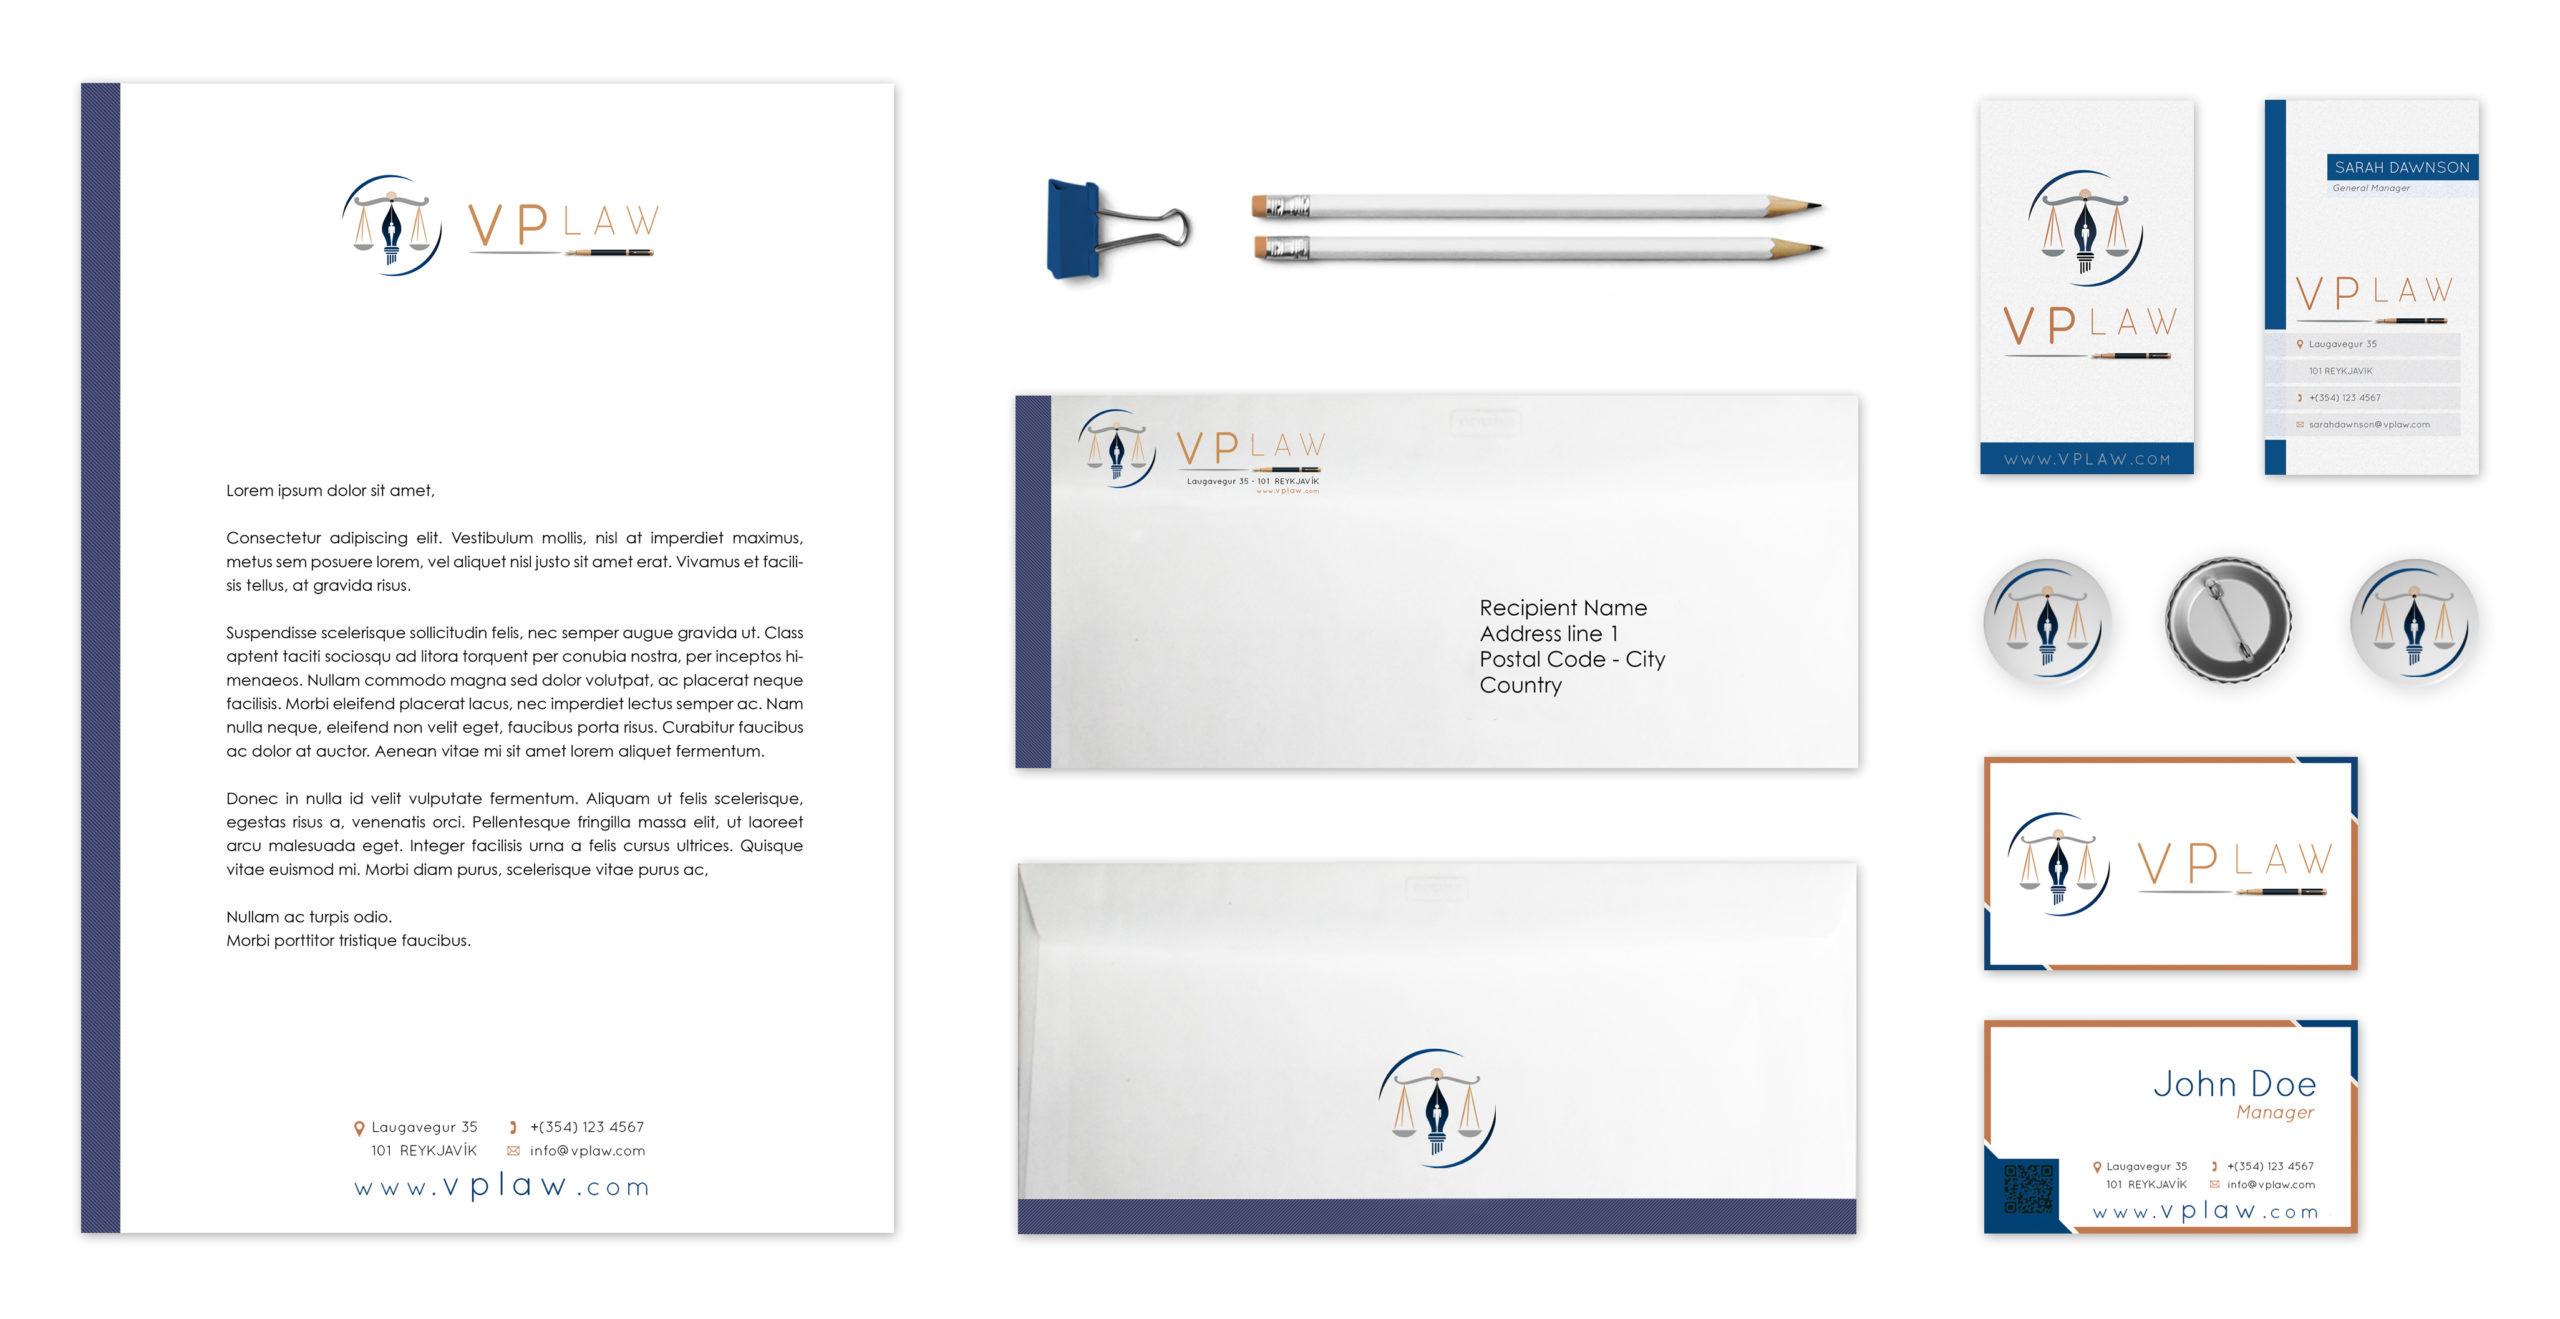 VP Law - Prints